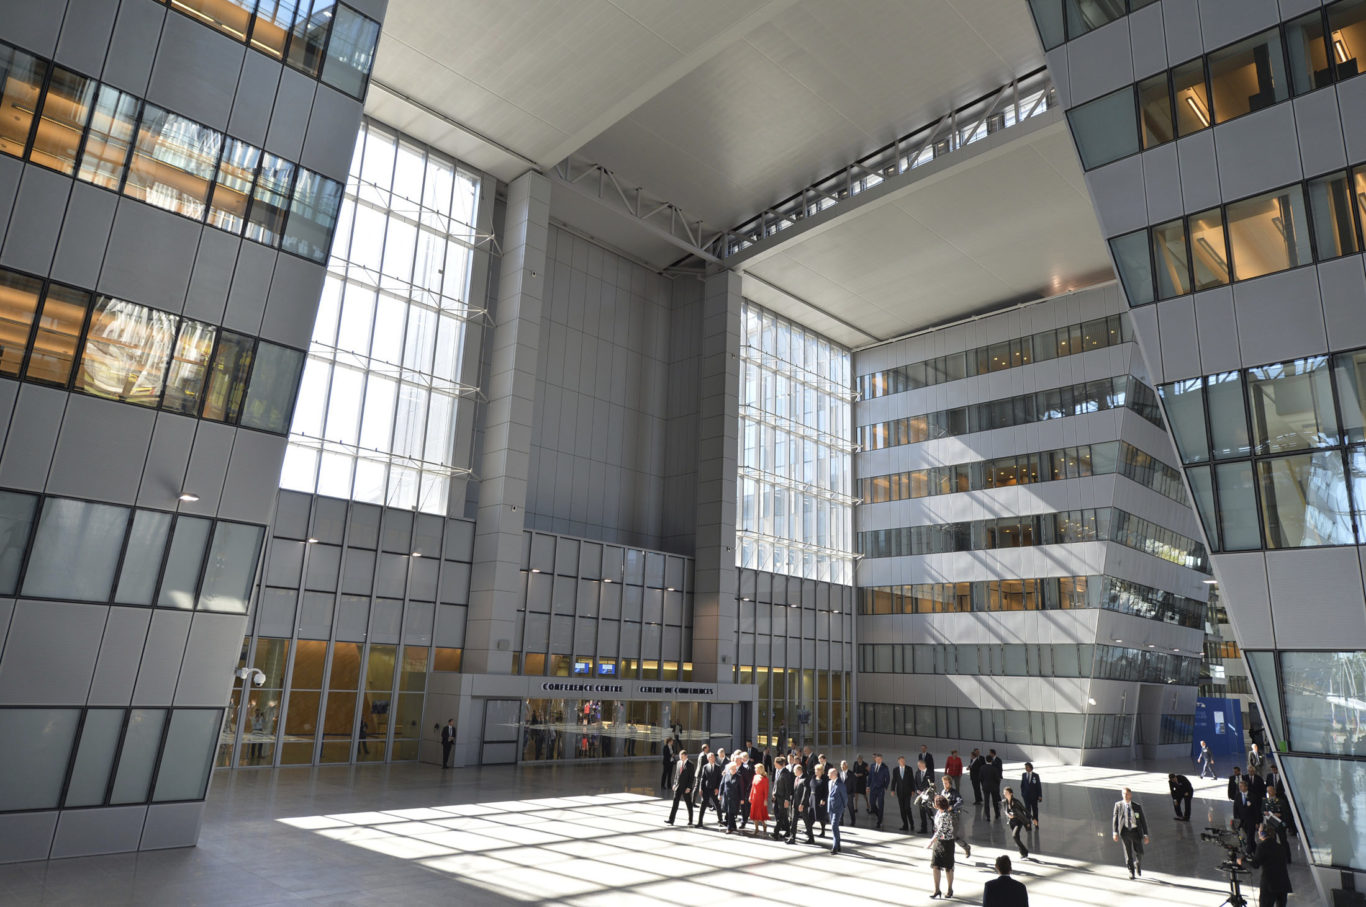 Slide 5 of 11, NATO Headquarters